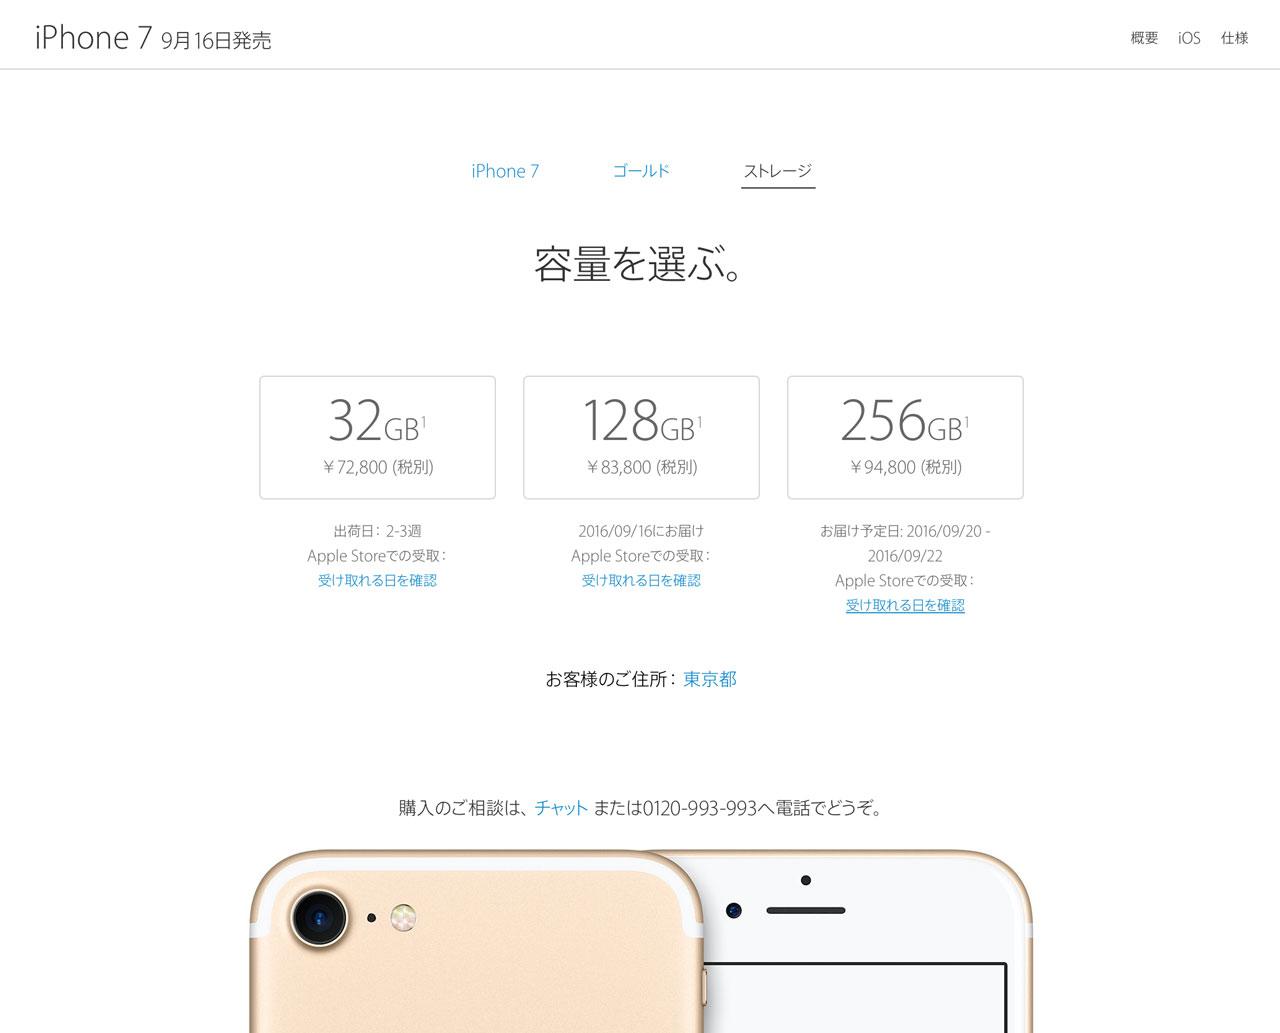 iphone-7-apple-store-japan-6